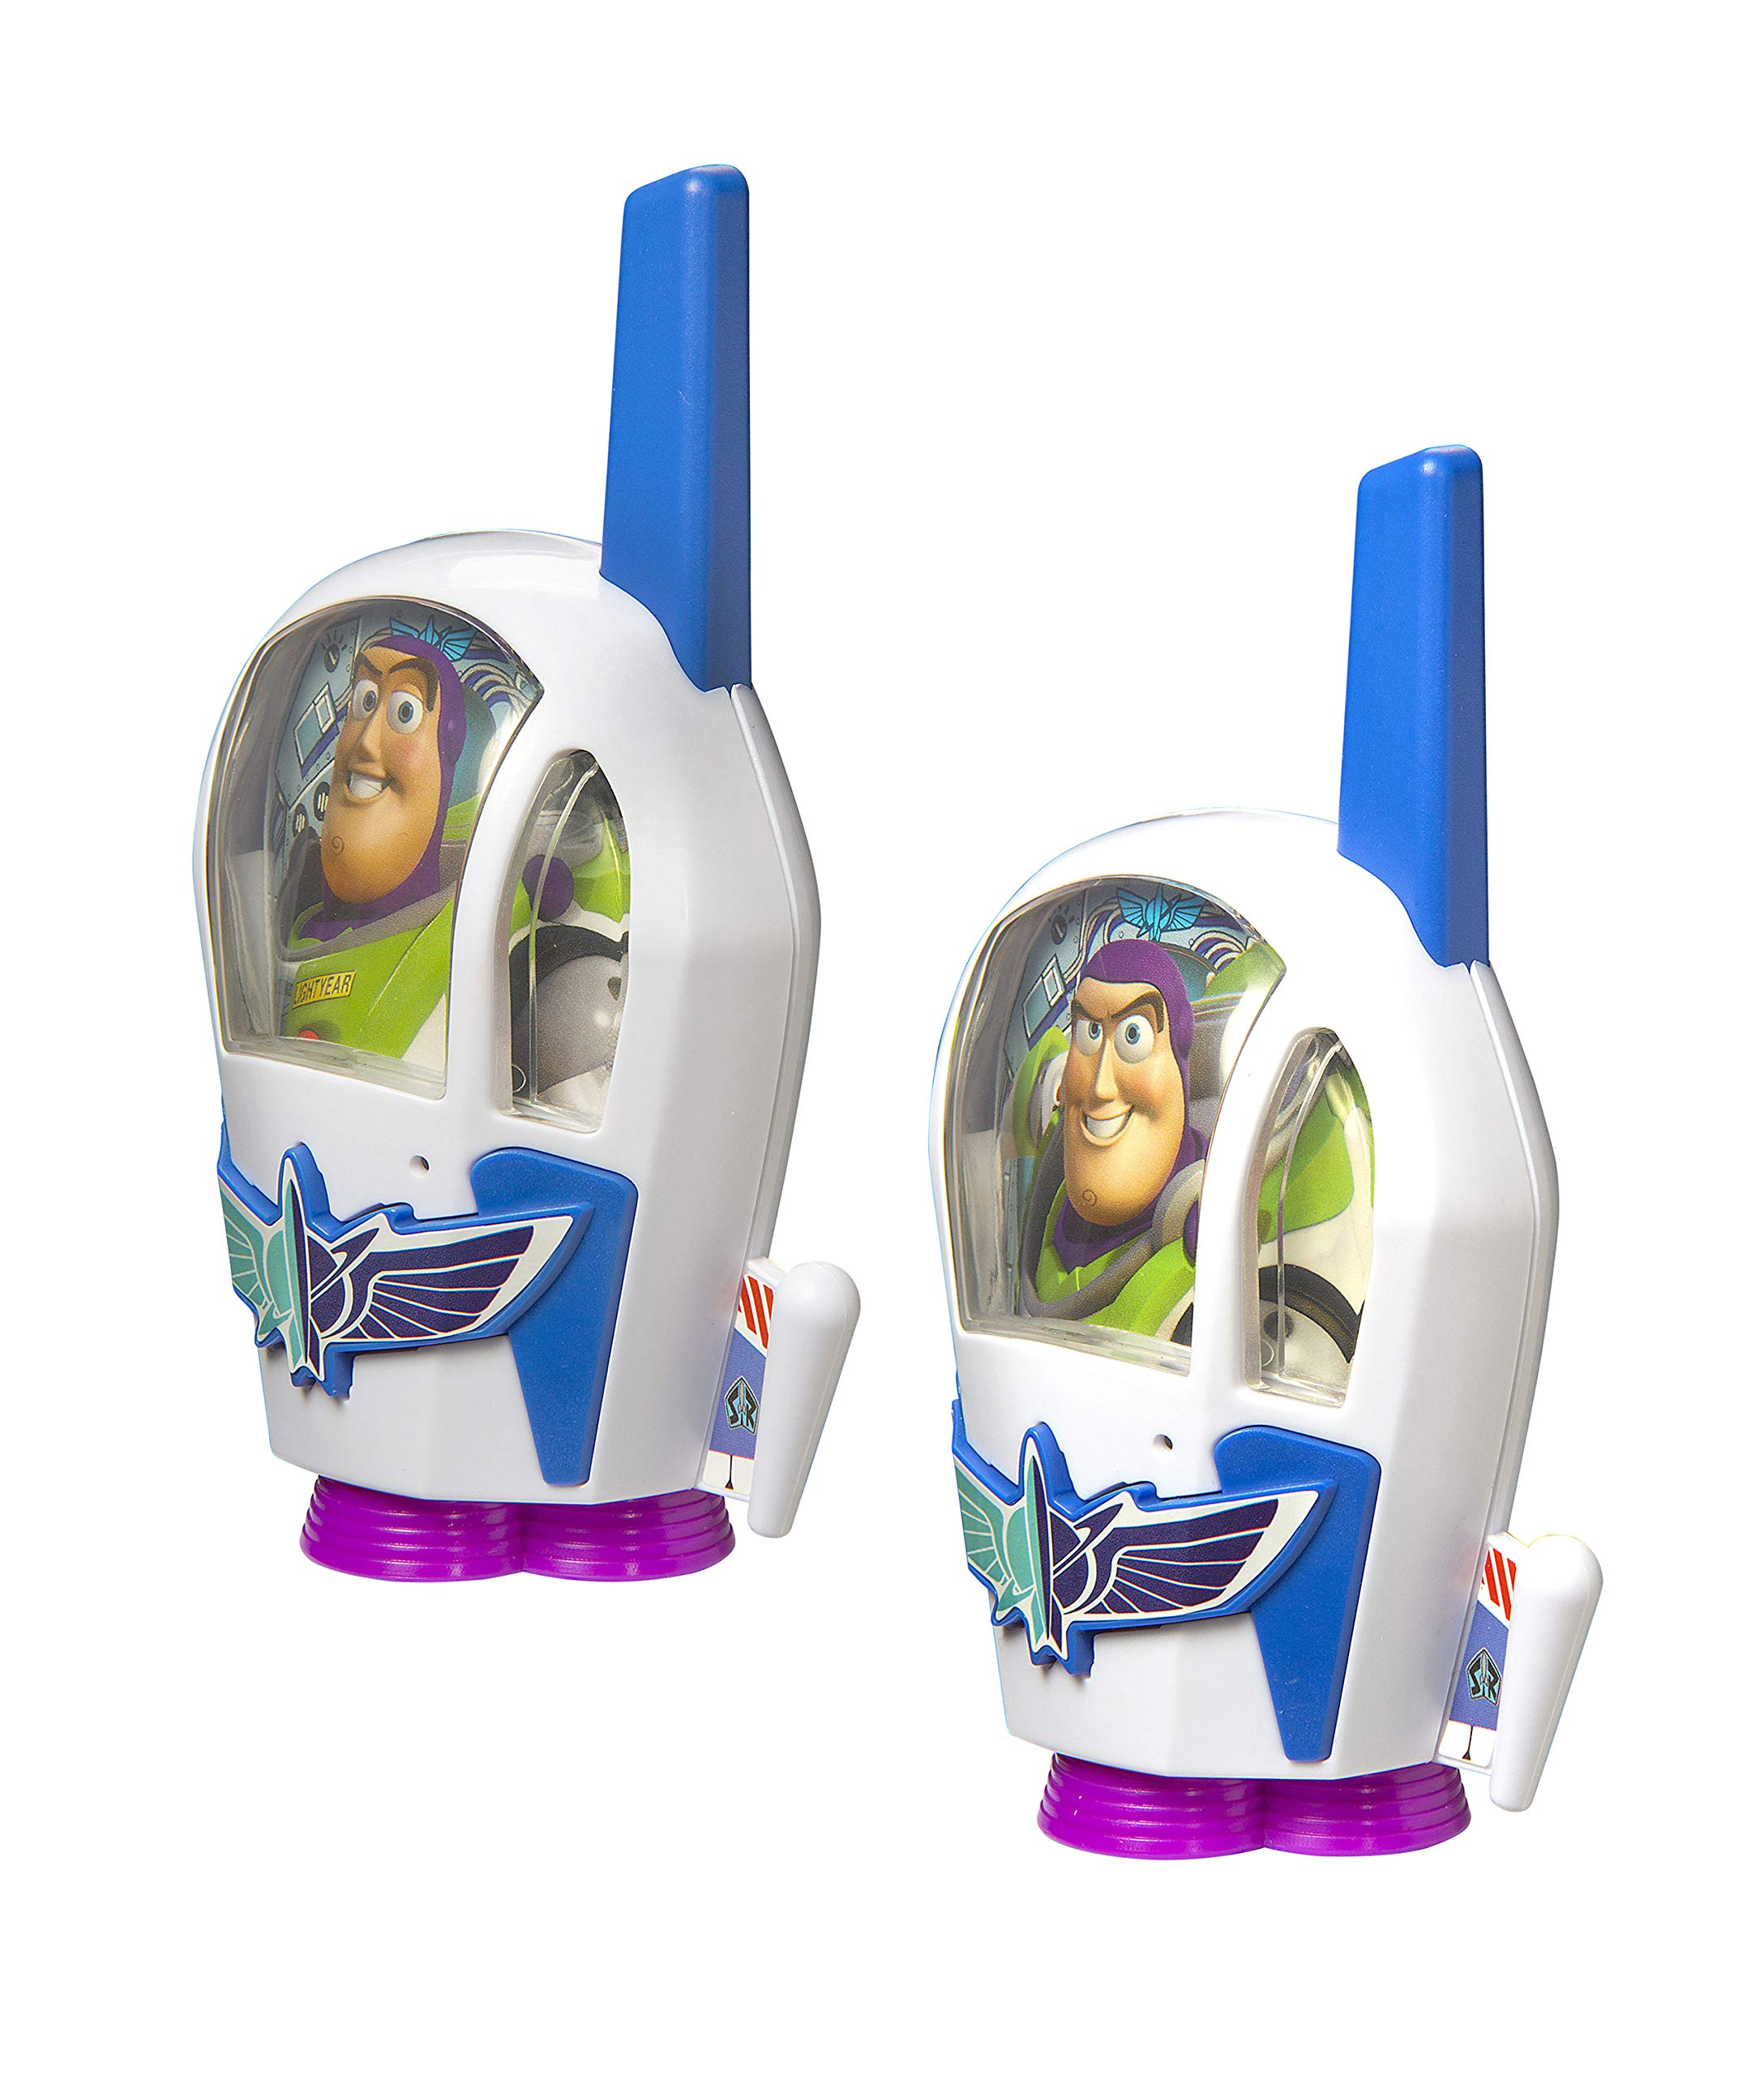 Toy Story 4 Buzz Lightyear Kids Walkie Talkies for Kids Static Free Extended Range Kid Friendly Easy to Use 2 Way Radio Toy Handheld Walkie Talkies Team Work Play Indoors or Outdoors by eKids (Image #2)